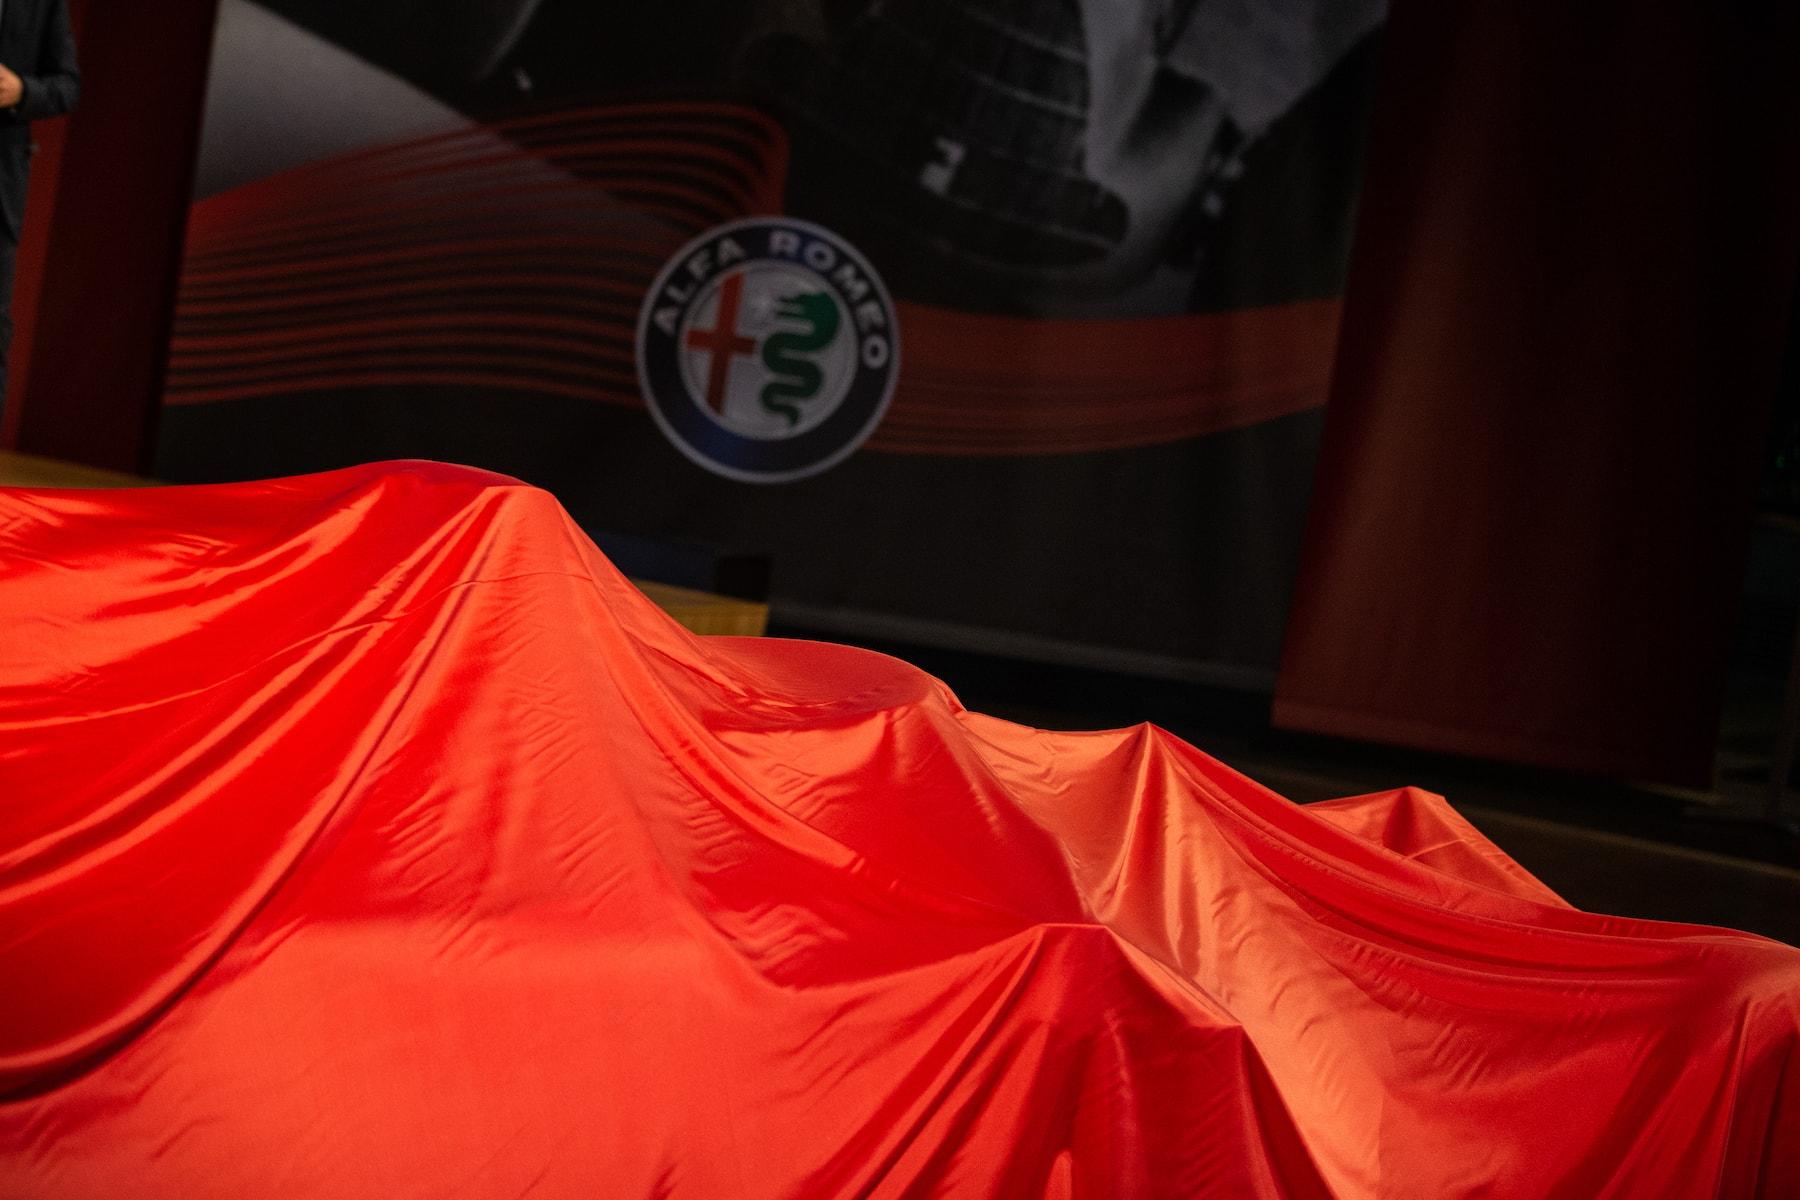 2019 Alfa Romeo at Museo Storico | 2019 Italian GP 10.jpg